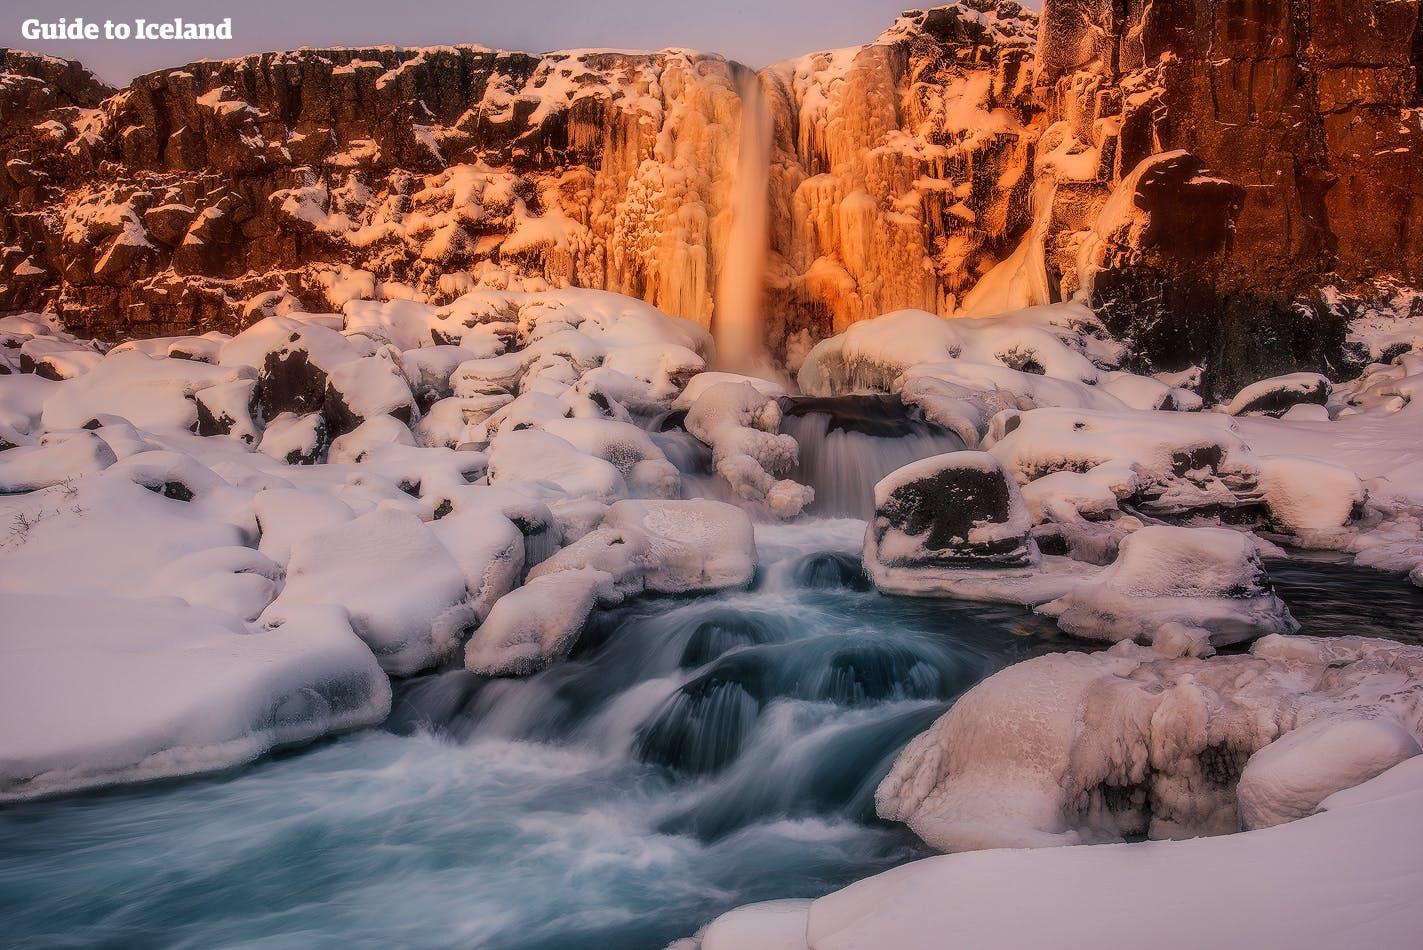 Öxárfoss-vattenfallet ligger i Þingvellir nationalpark längs Gyllene cirkeln